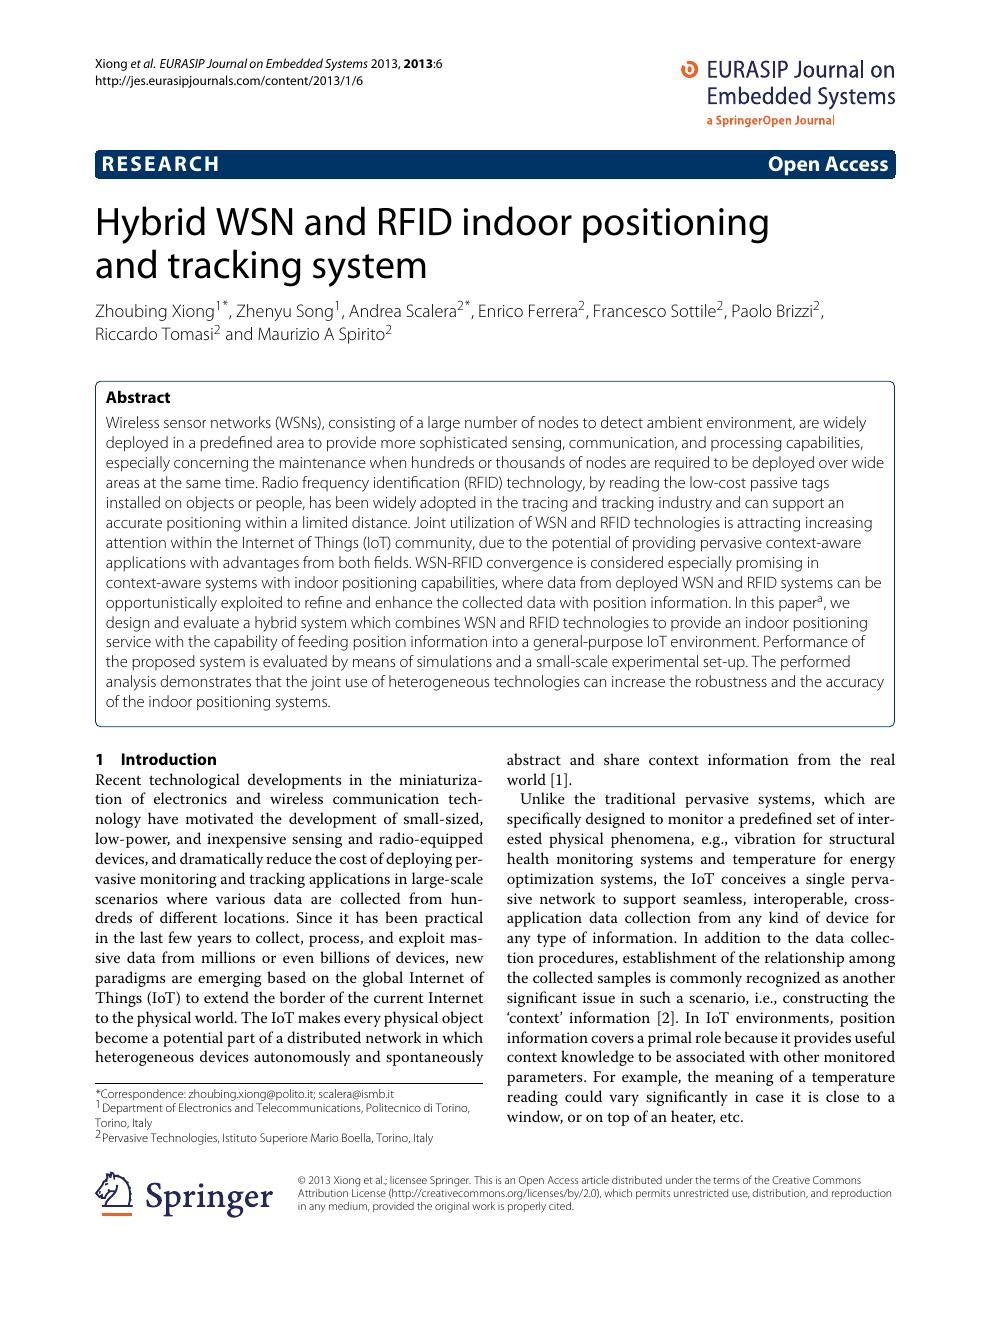 Blind Navigation System Using Rfid For Indoor Environments Pdf Download